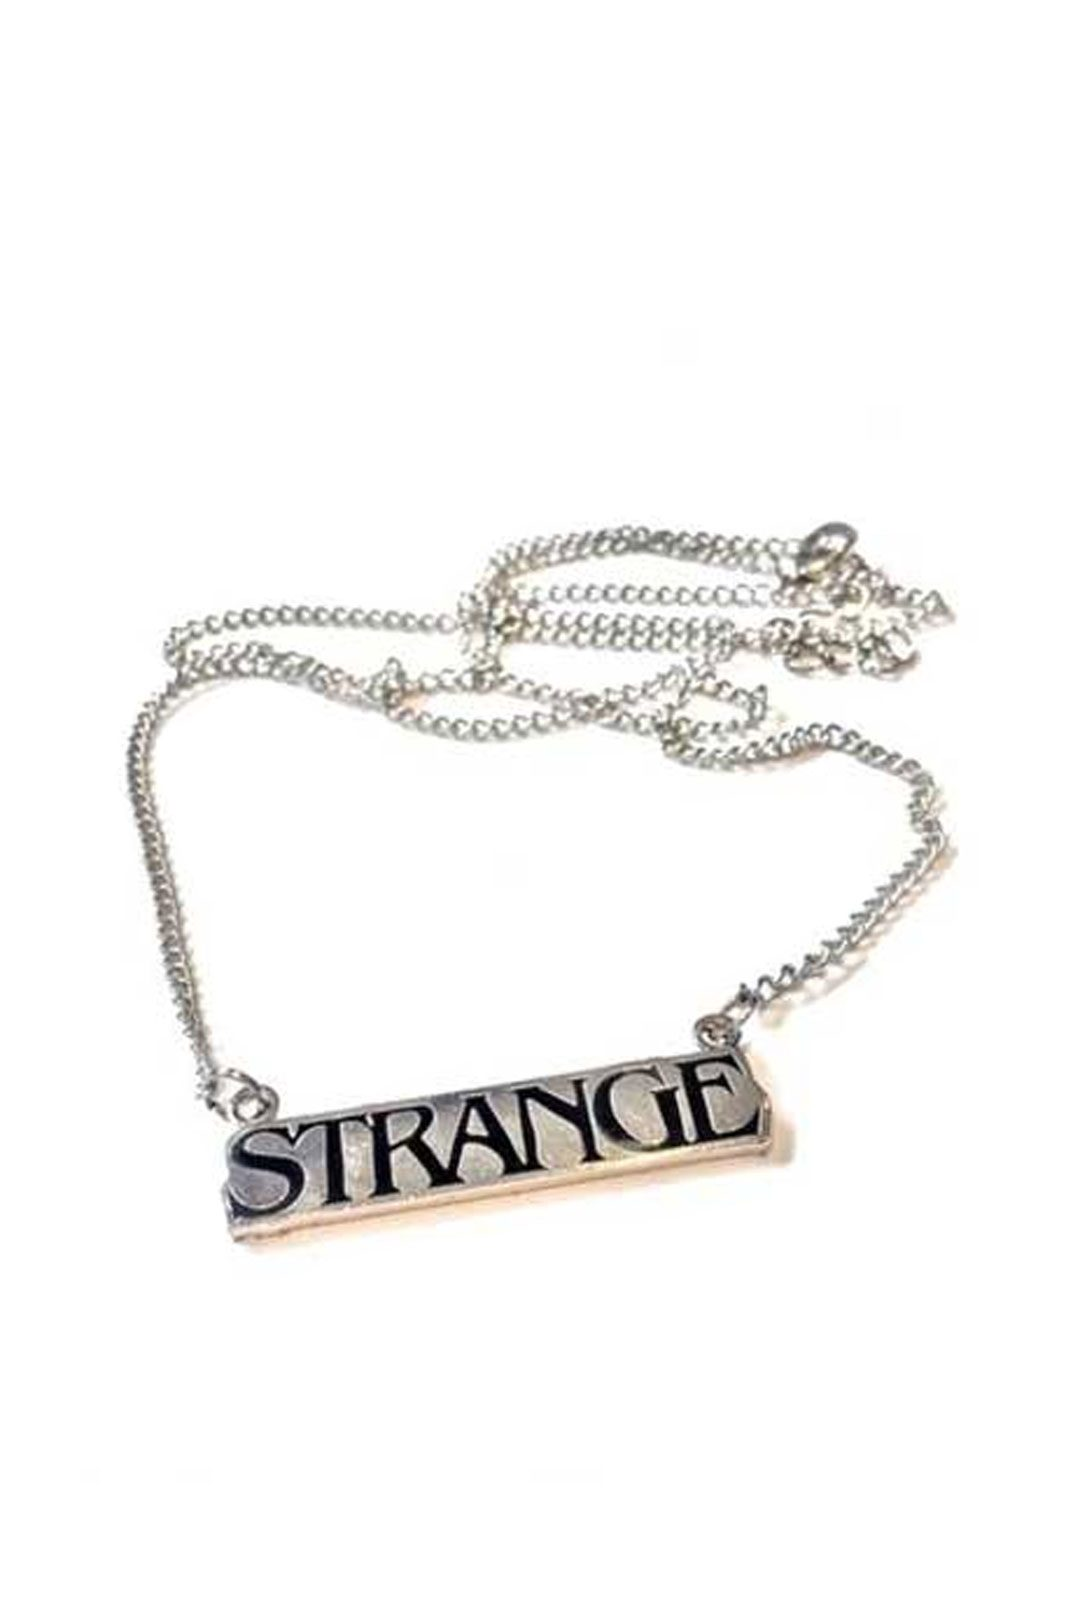 cosmic strange necklace